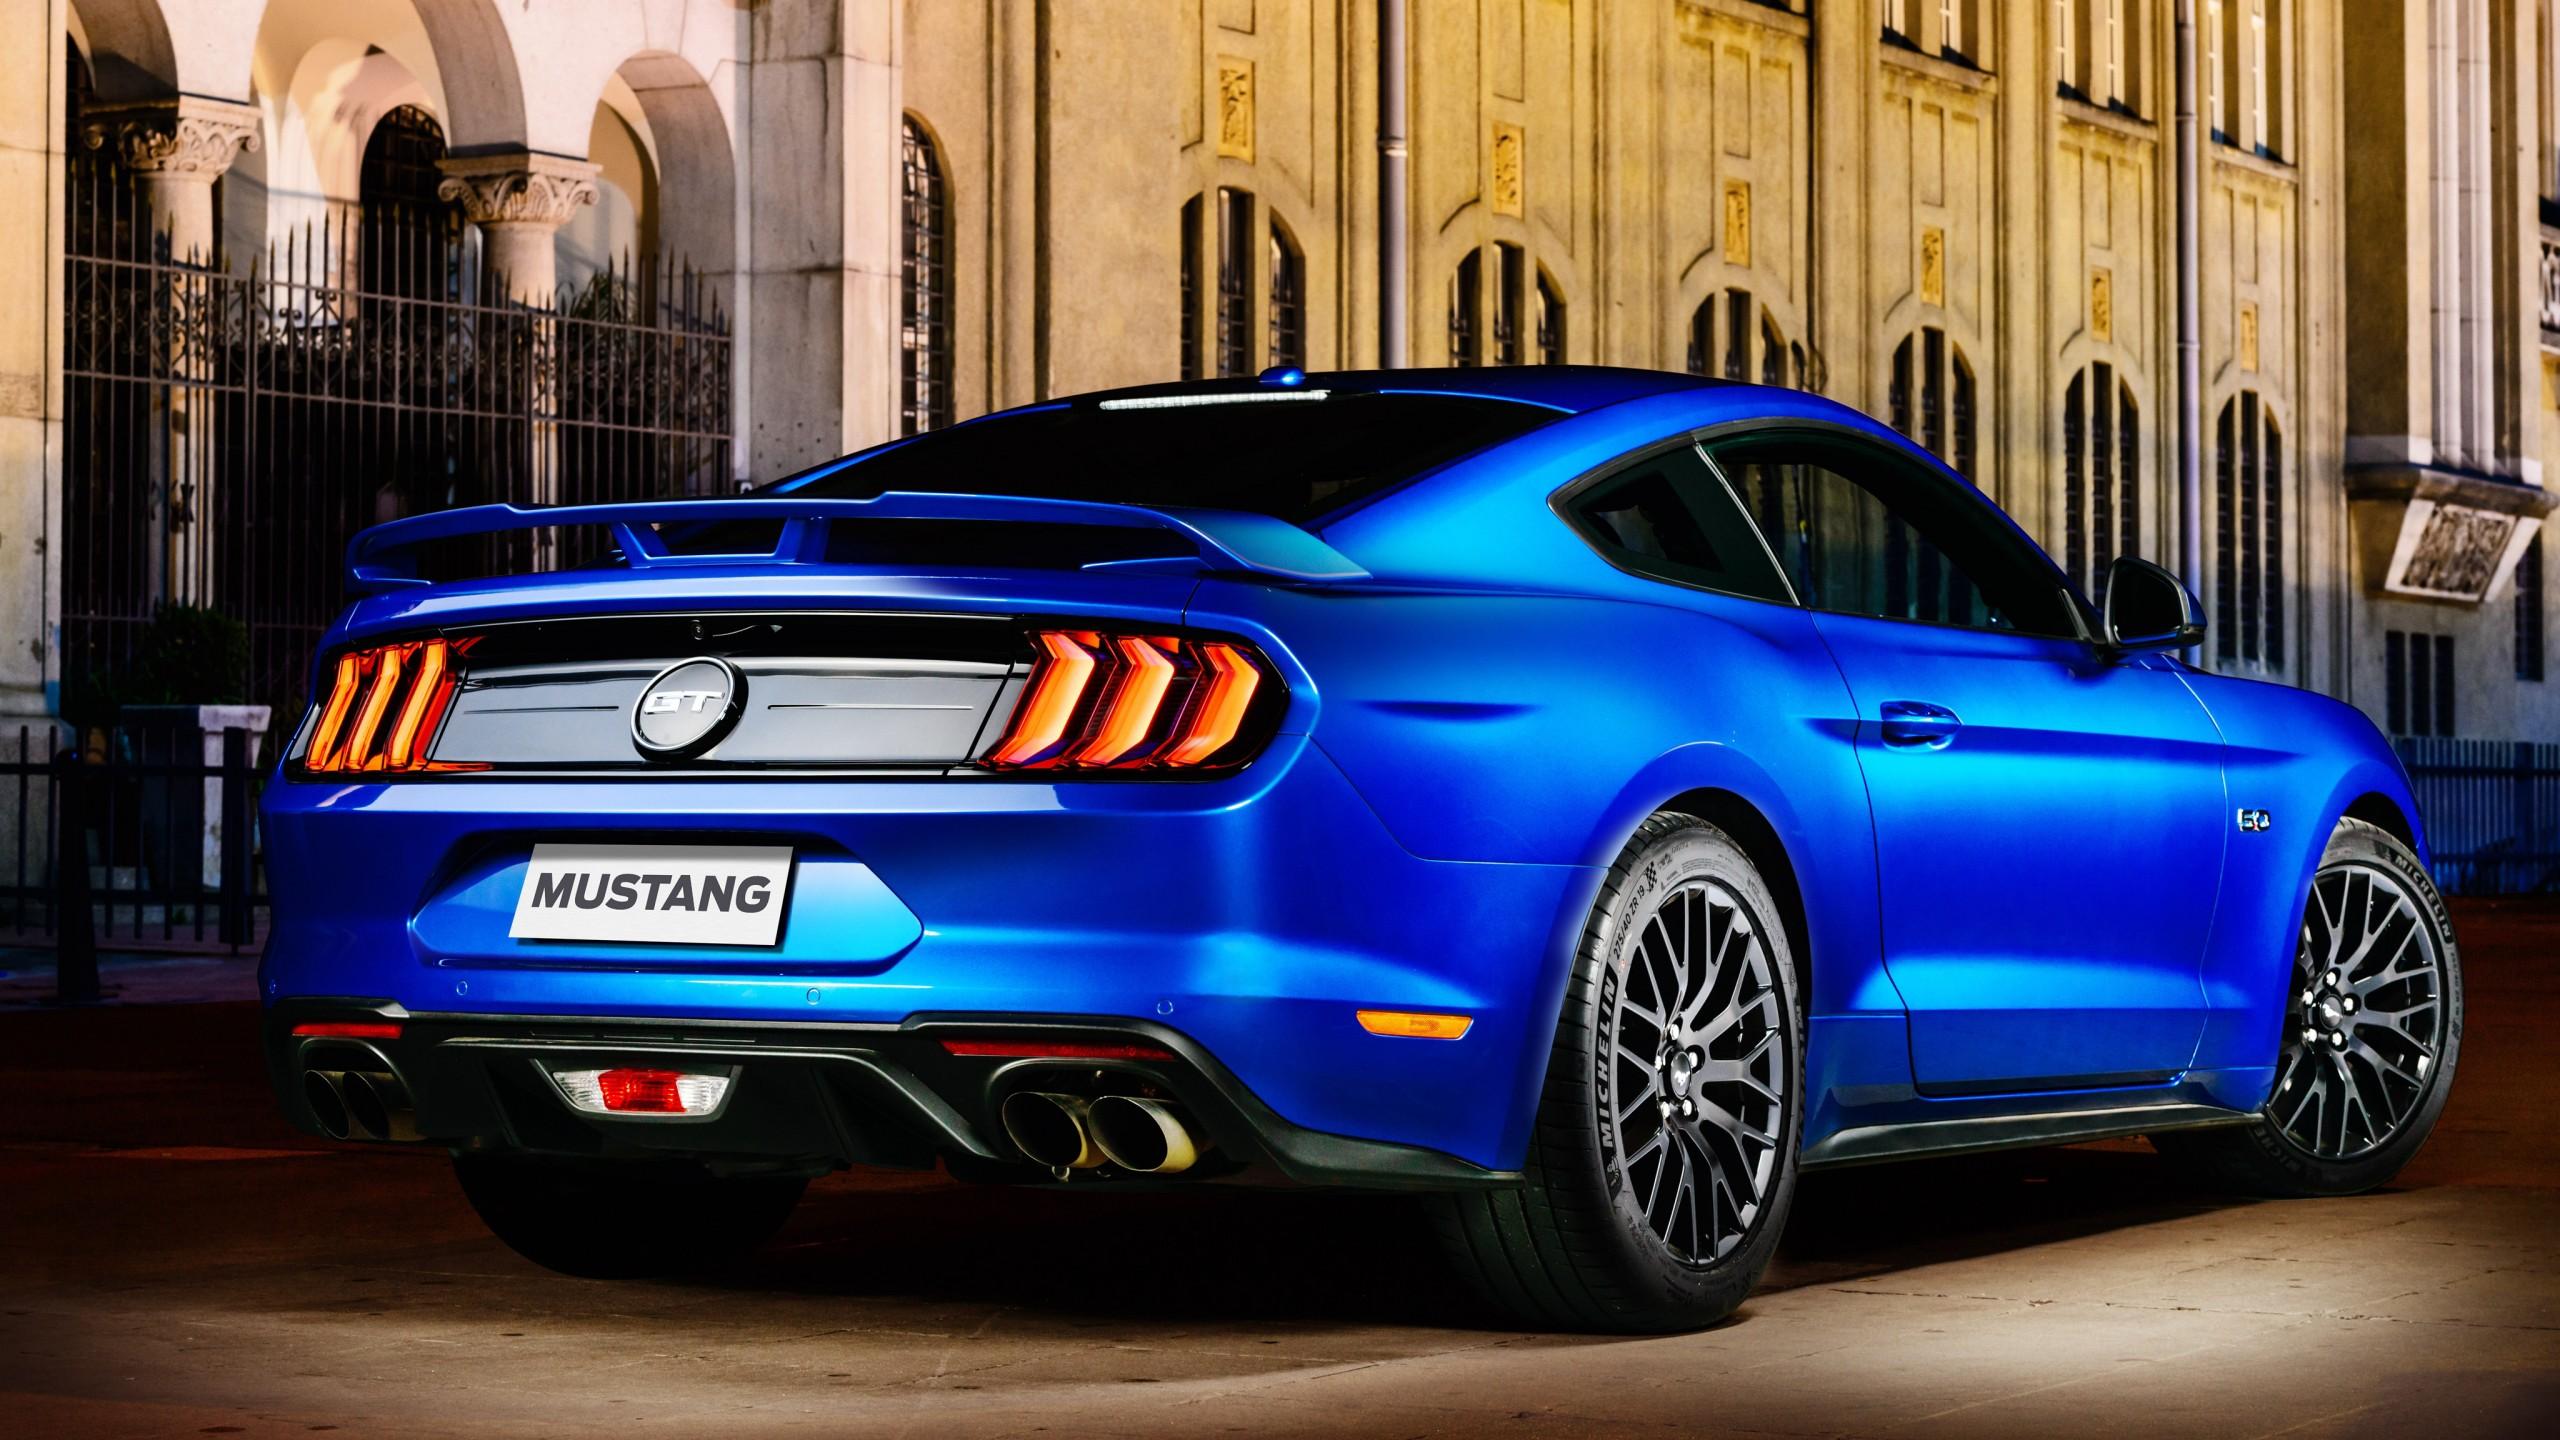 2018 Ford Mustang Gt Fastback 4k 12 Wallpaper Hd Car